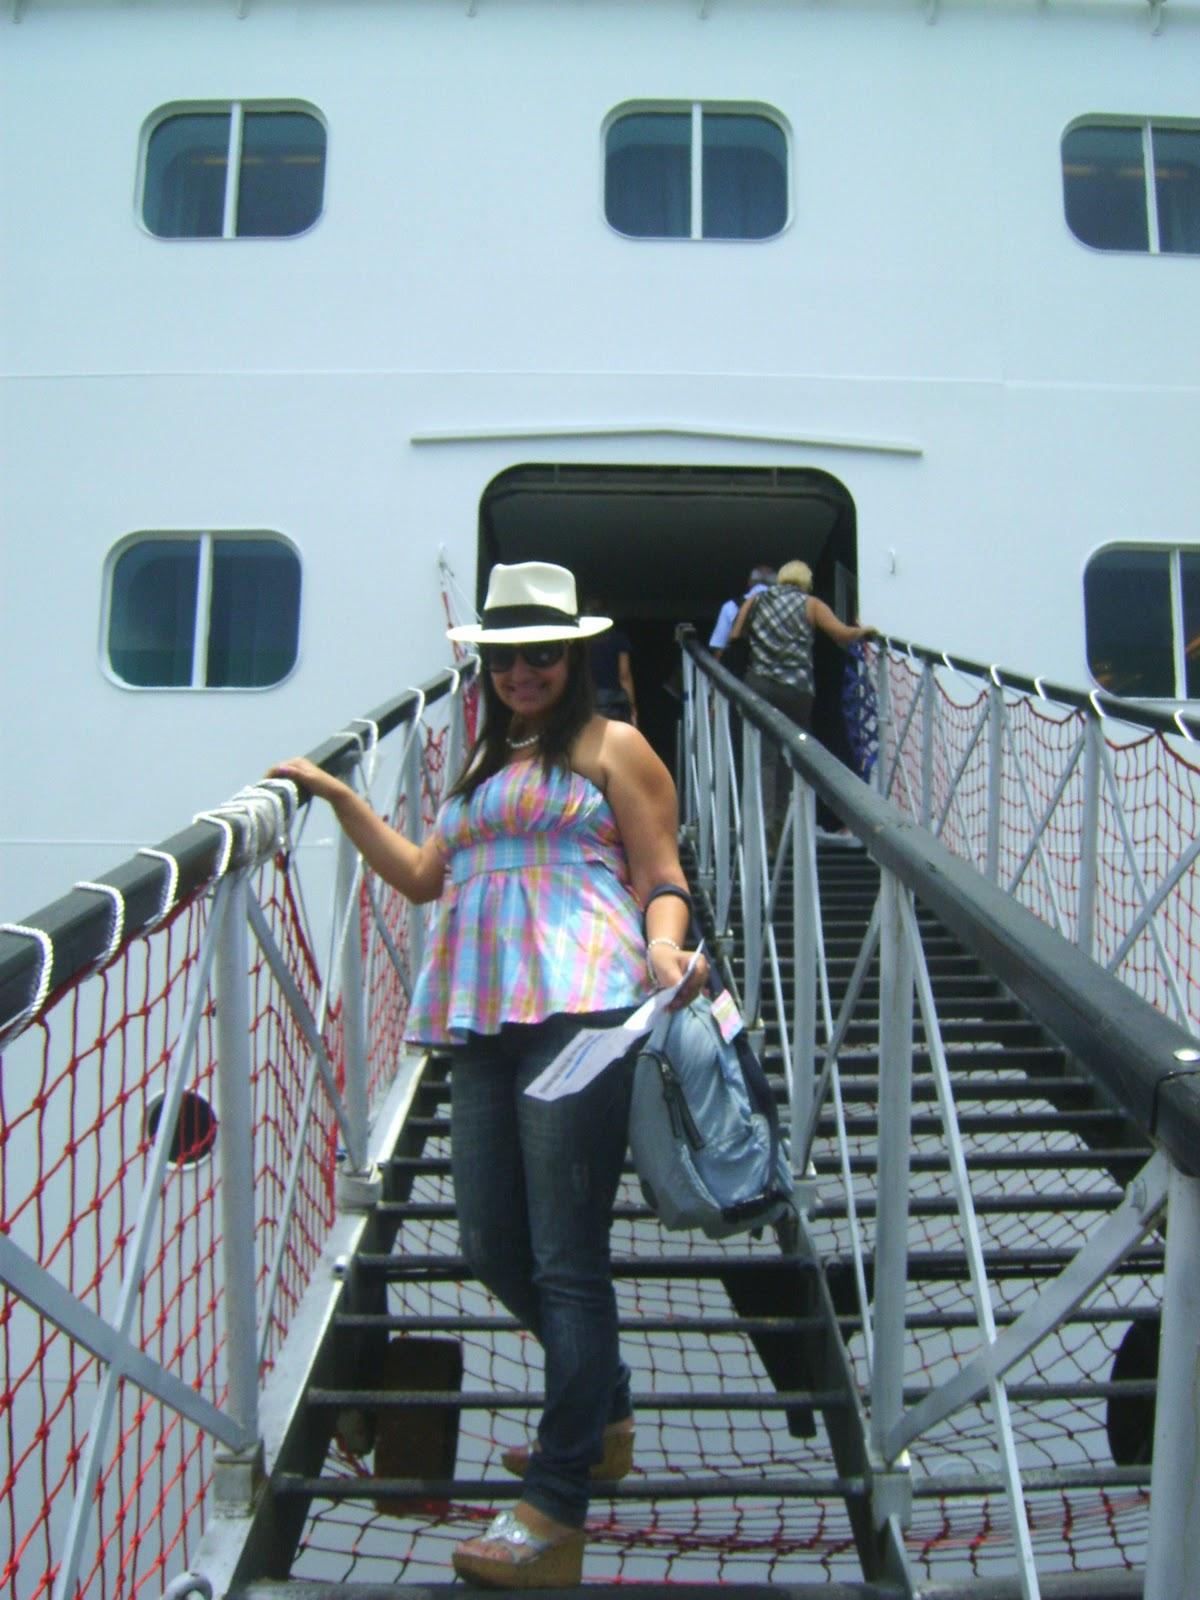 cruzeiro, navio, como se vestir, looks, ideias, roupas